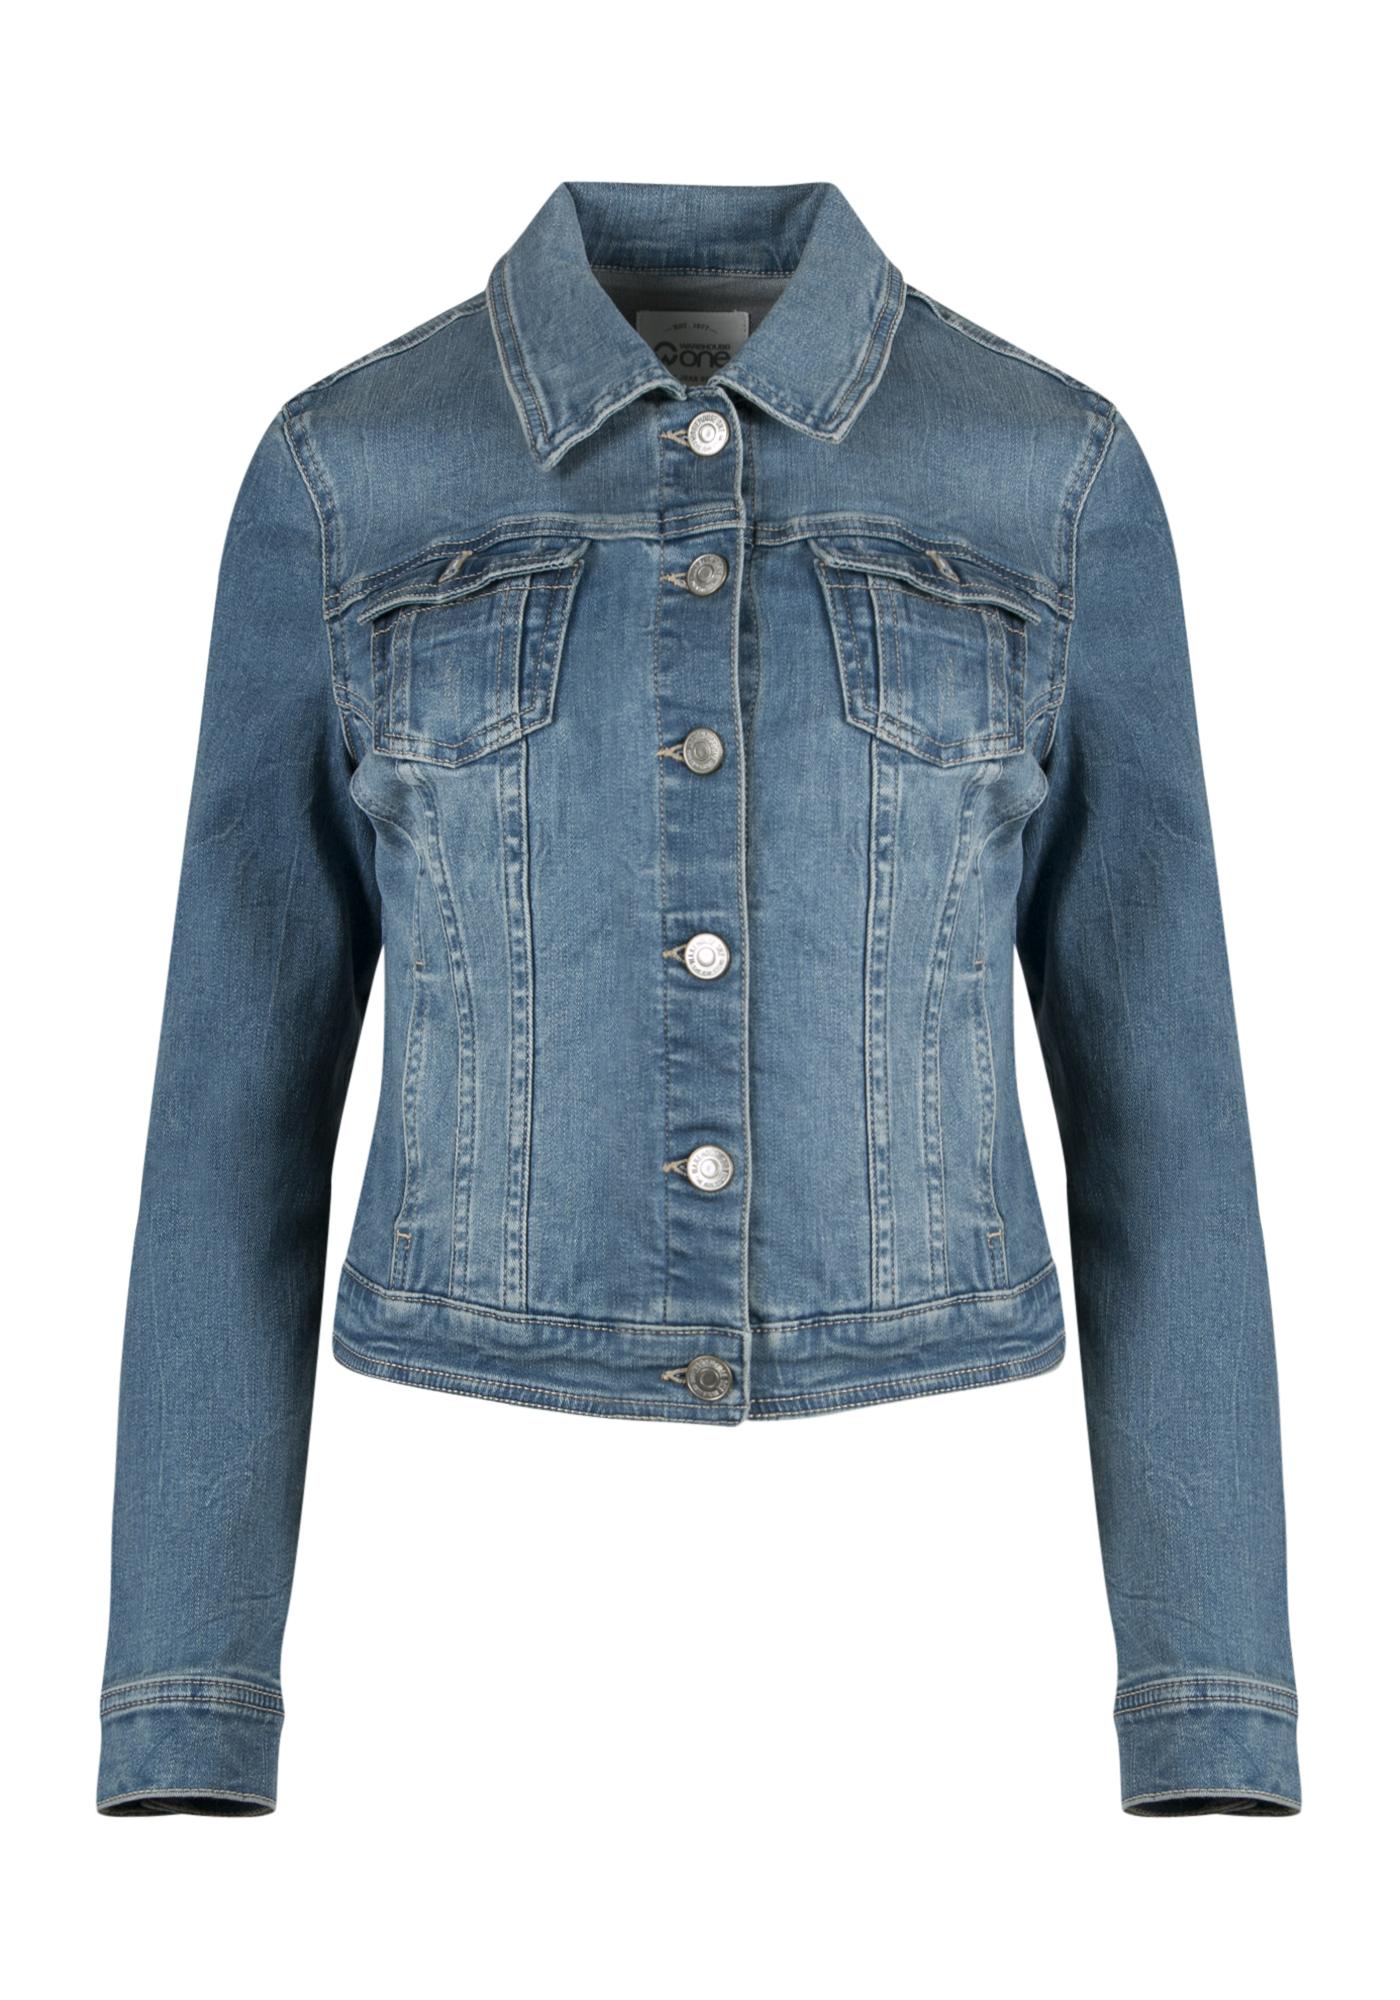 a8ba294a697 Women s Super Soft Jean Jacket